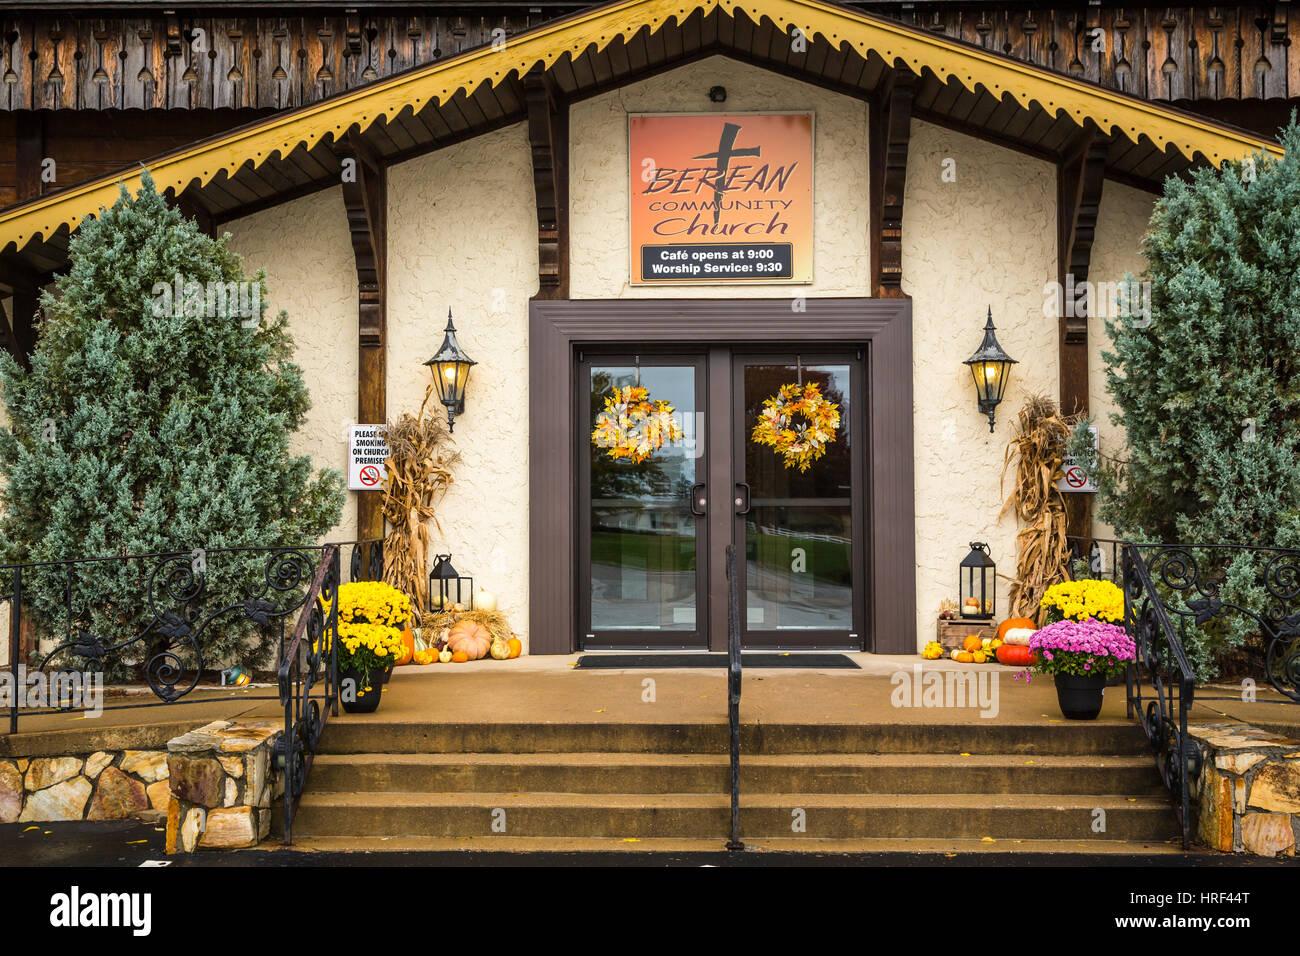 The Berean Community Church building in Winesburg, Ohio, USA. - Stock Image